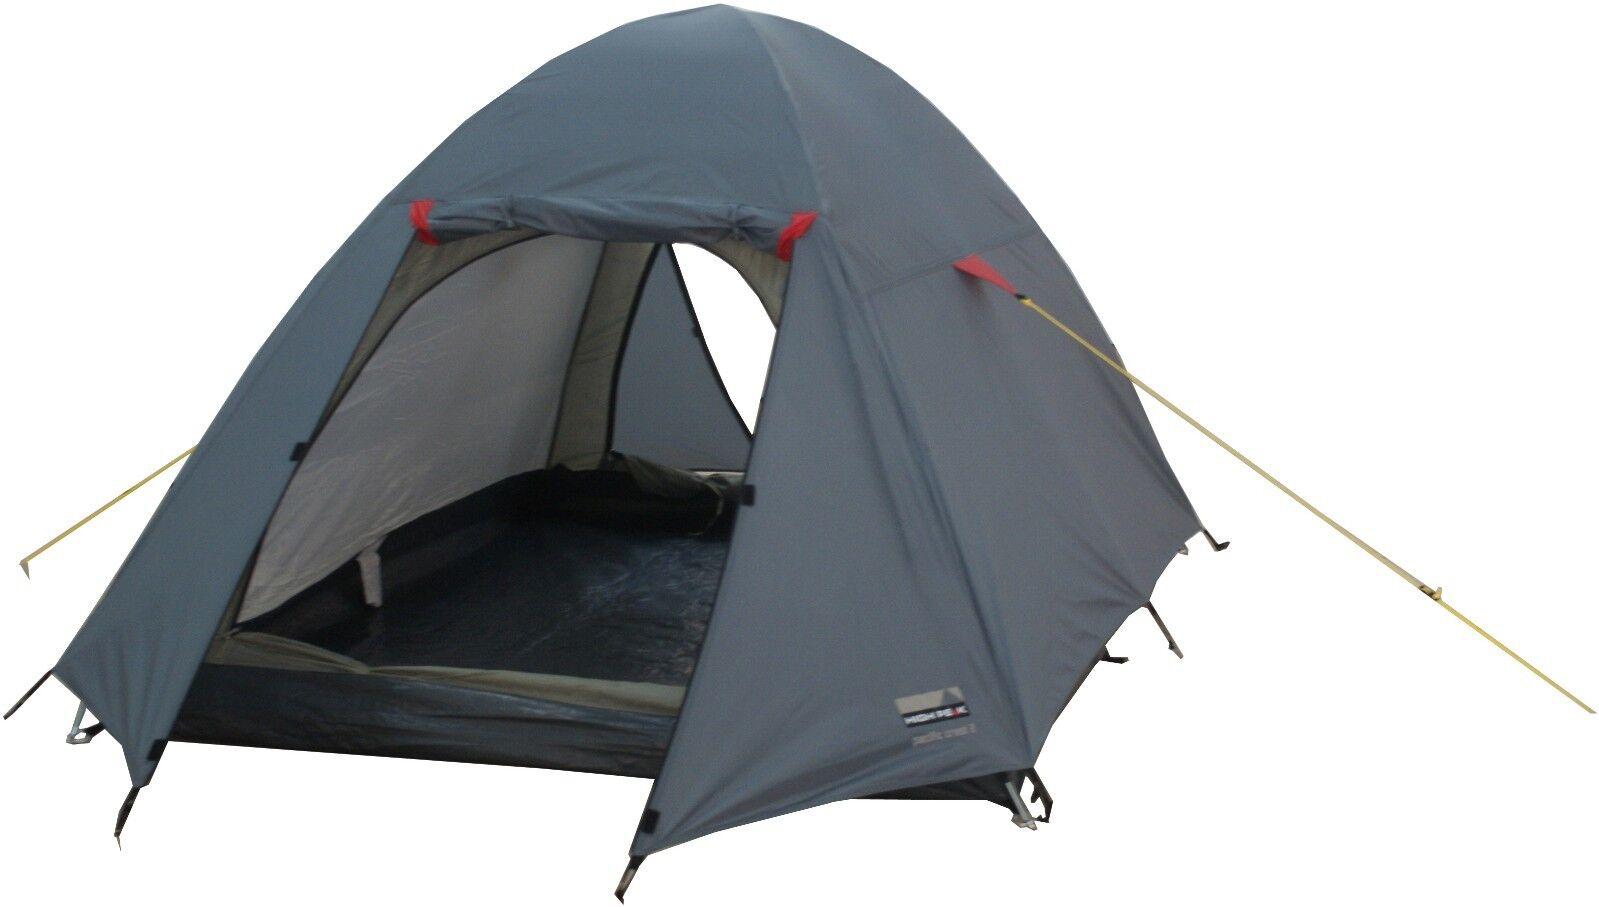 High Peak Pacific Crest 2-Person 3 Season Waterproof Tent